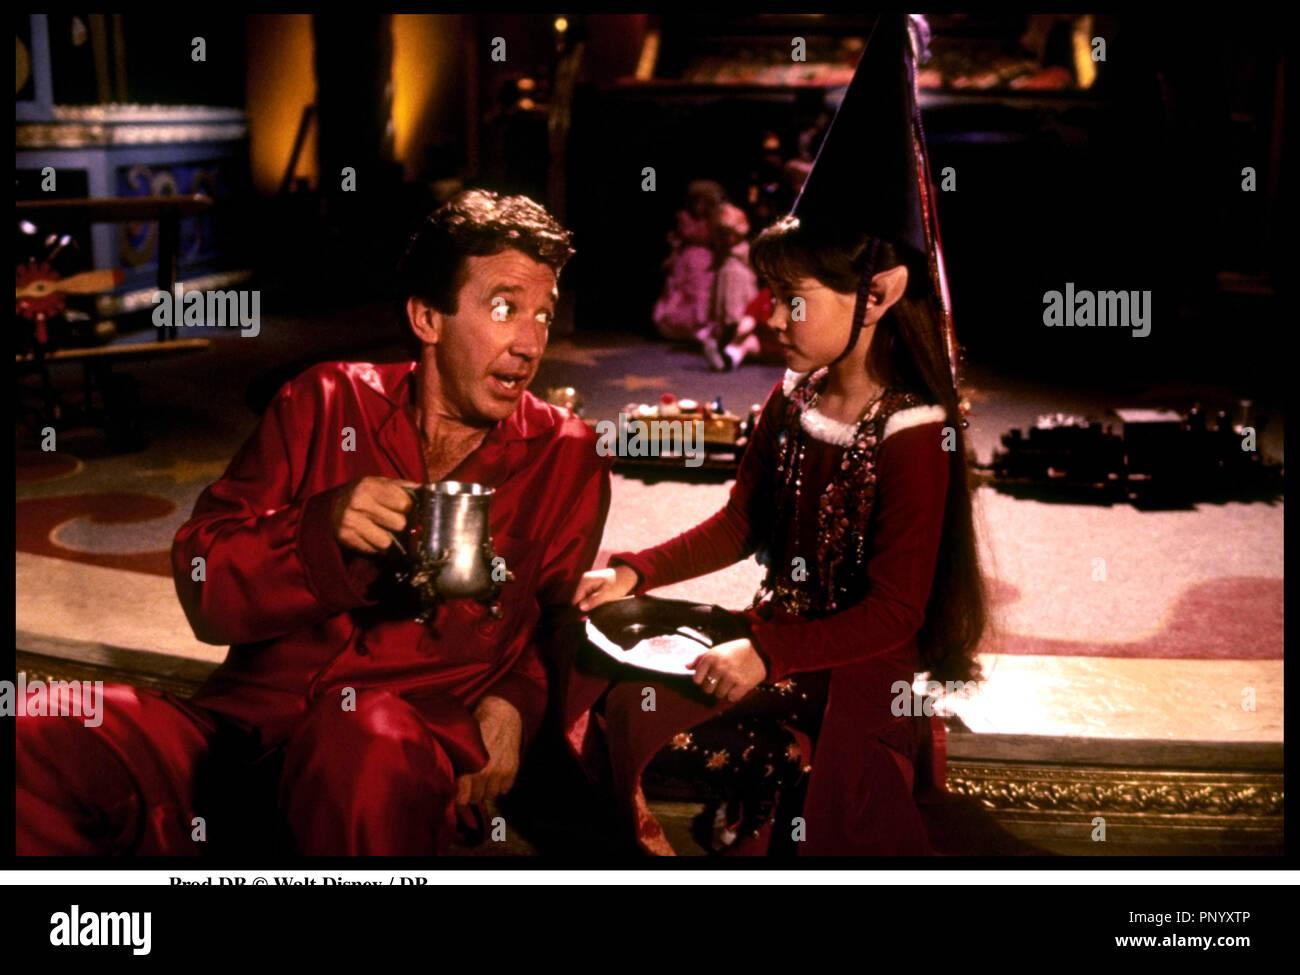 Image De Noel Walt Disney.Prod Db C Walt Disney Dr Super Noel The Santa Clause De